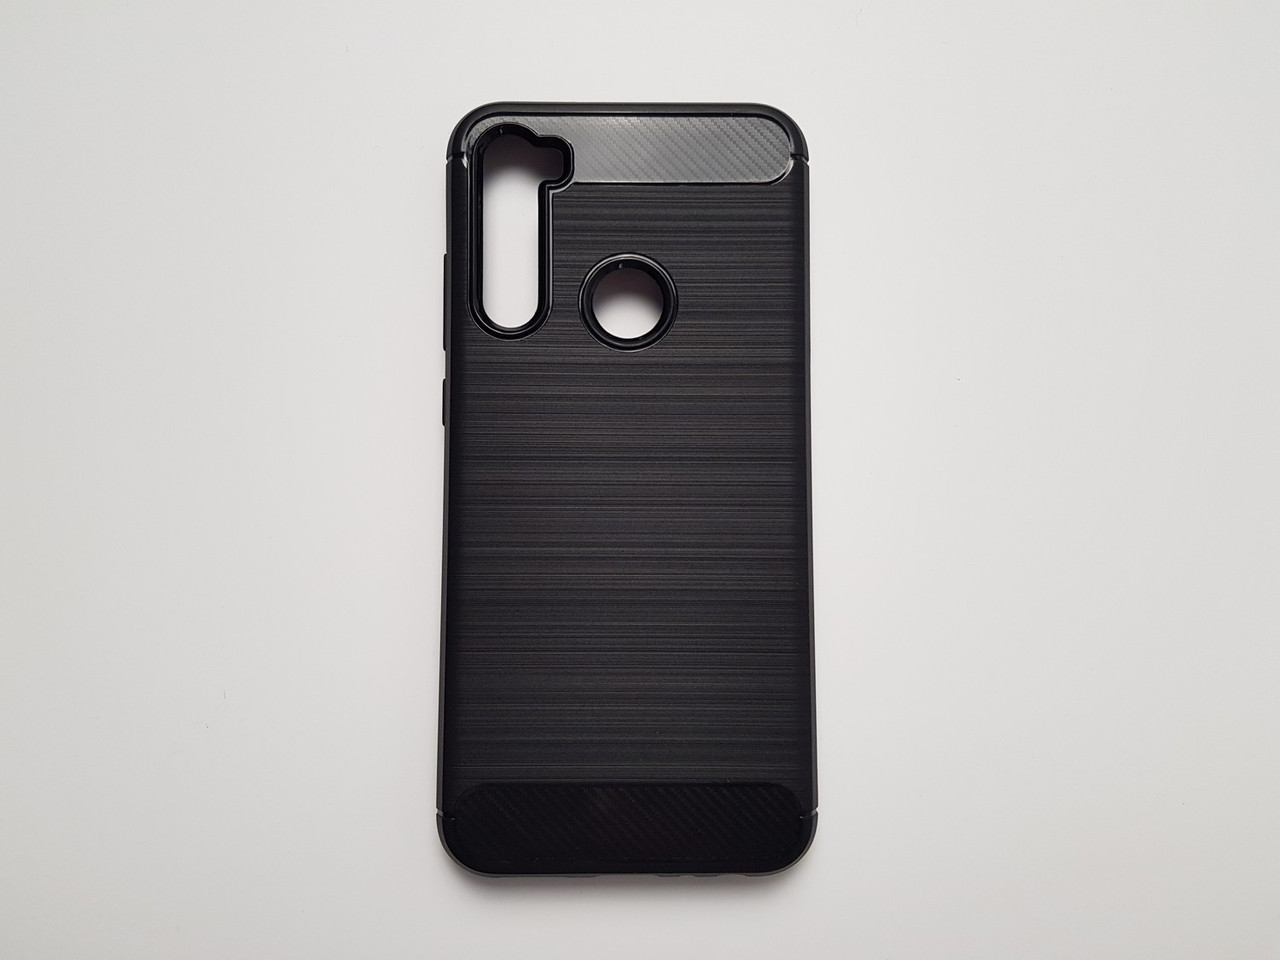 Чехол бампер Carbon Fiber для Xiaomi Redmi Note 8T